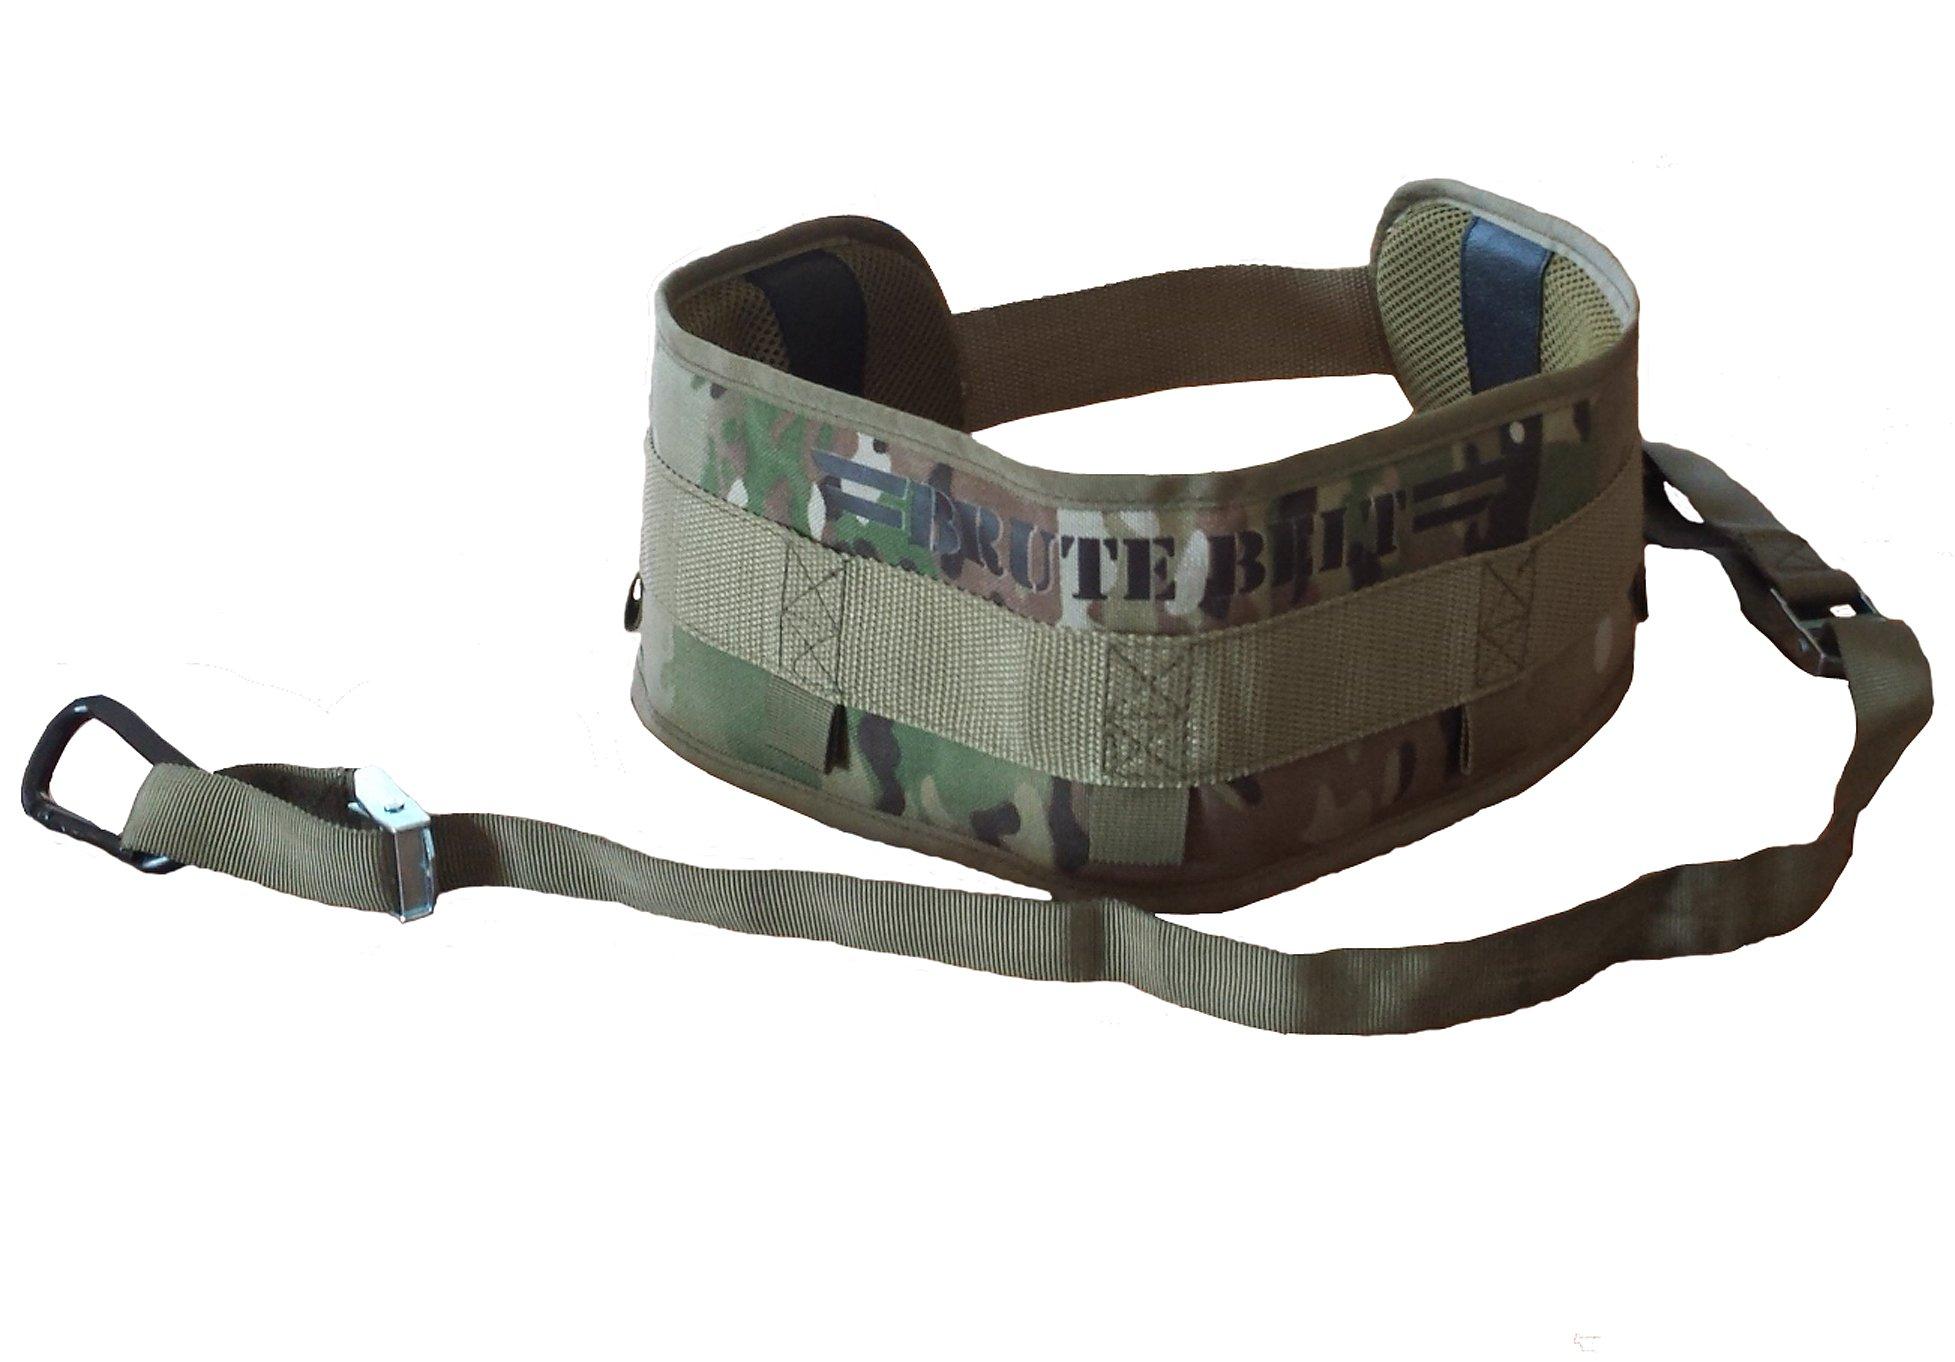 Brute Belt - Nylon Dip Pullup Squat Belt (Camo, Small)